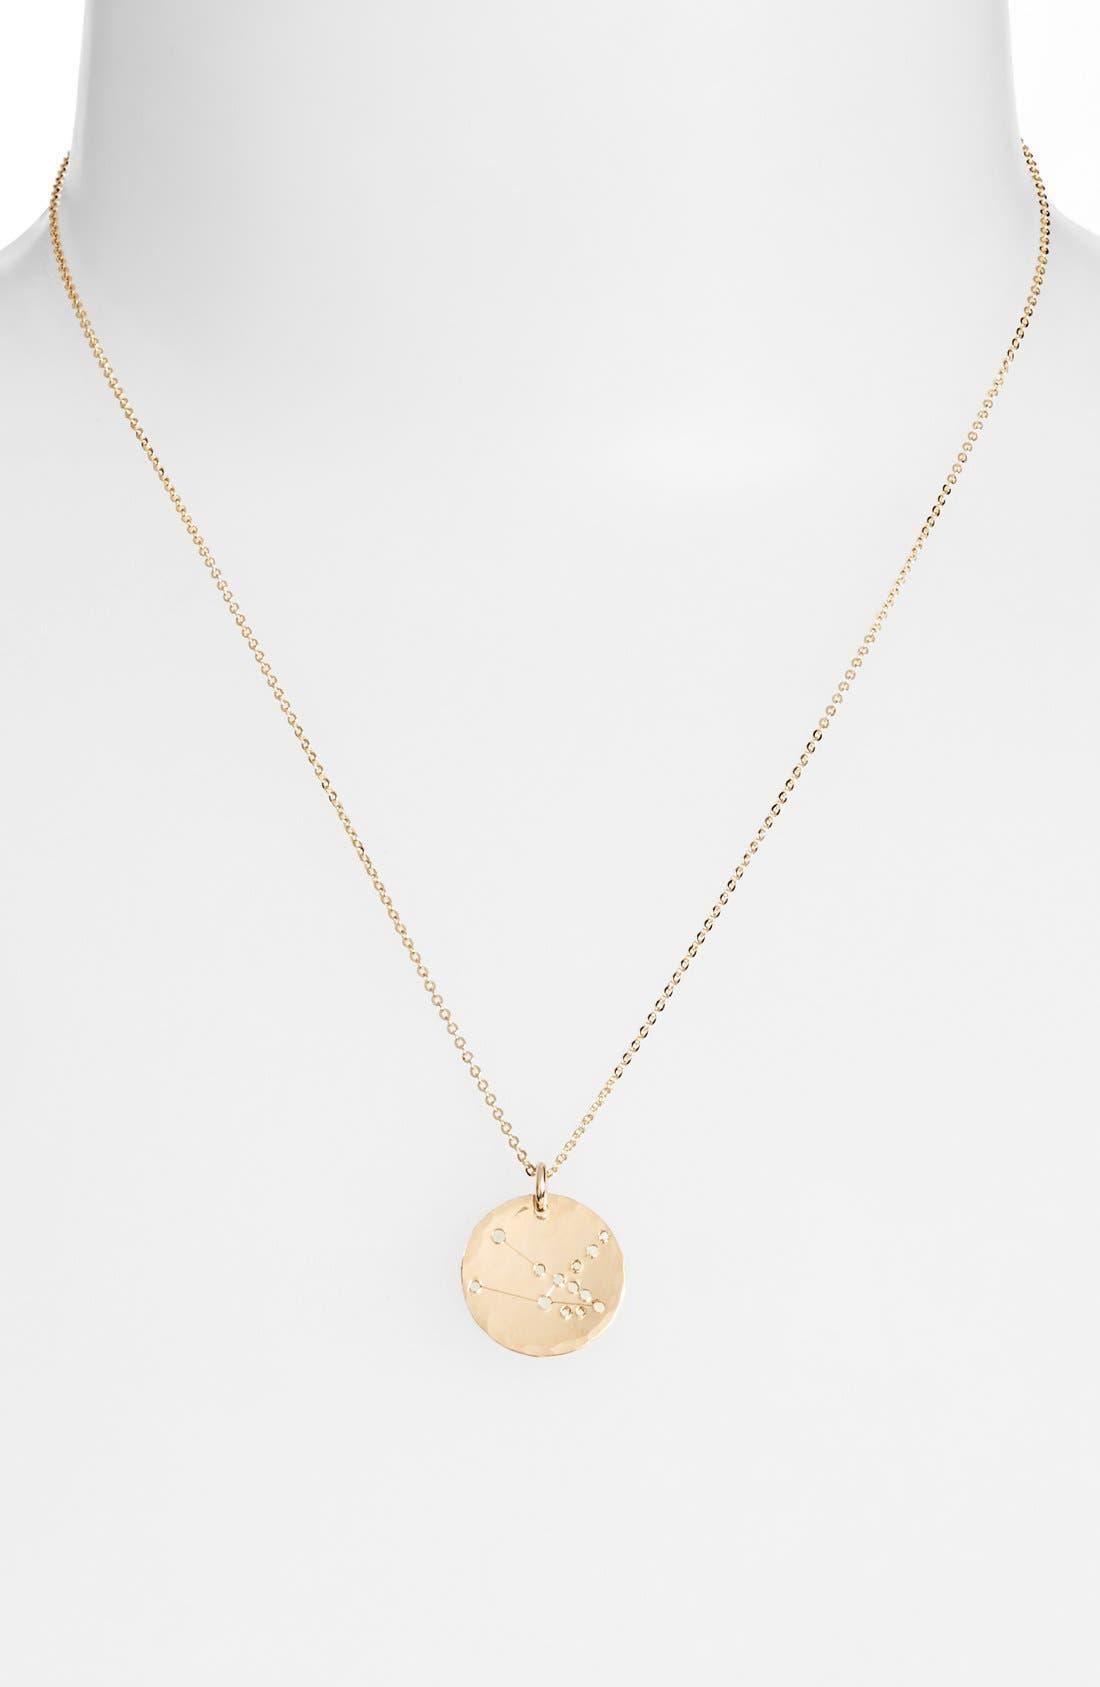 Ija 'Small Zodiac' 14k-Gold Fill Necklace,                             Alternate thumbnail 26, color,